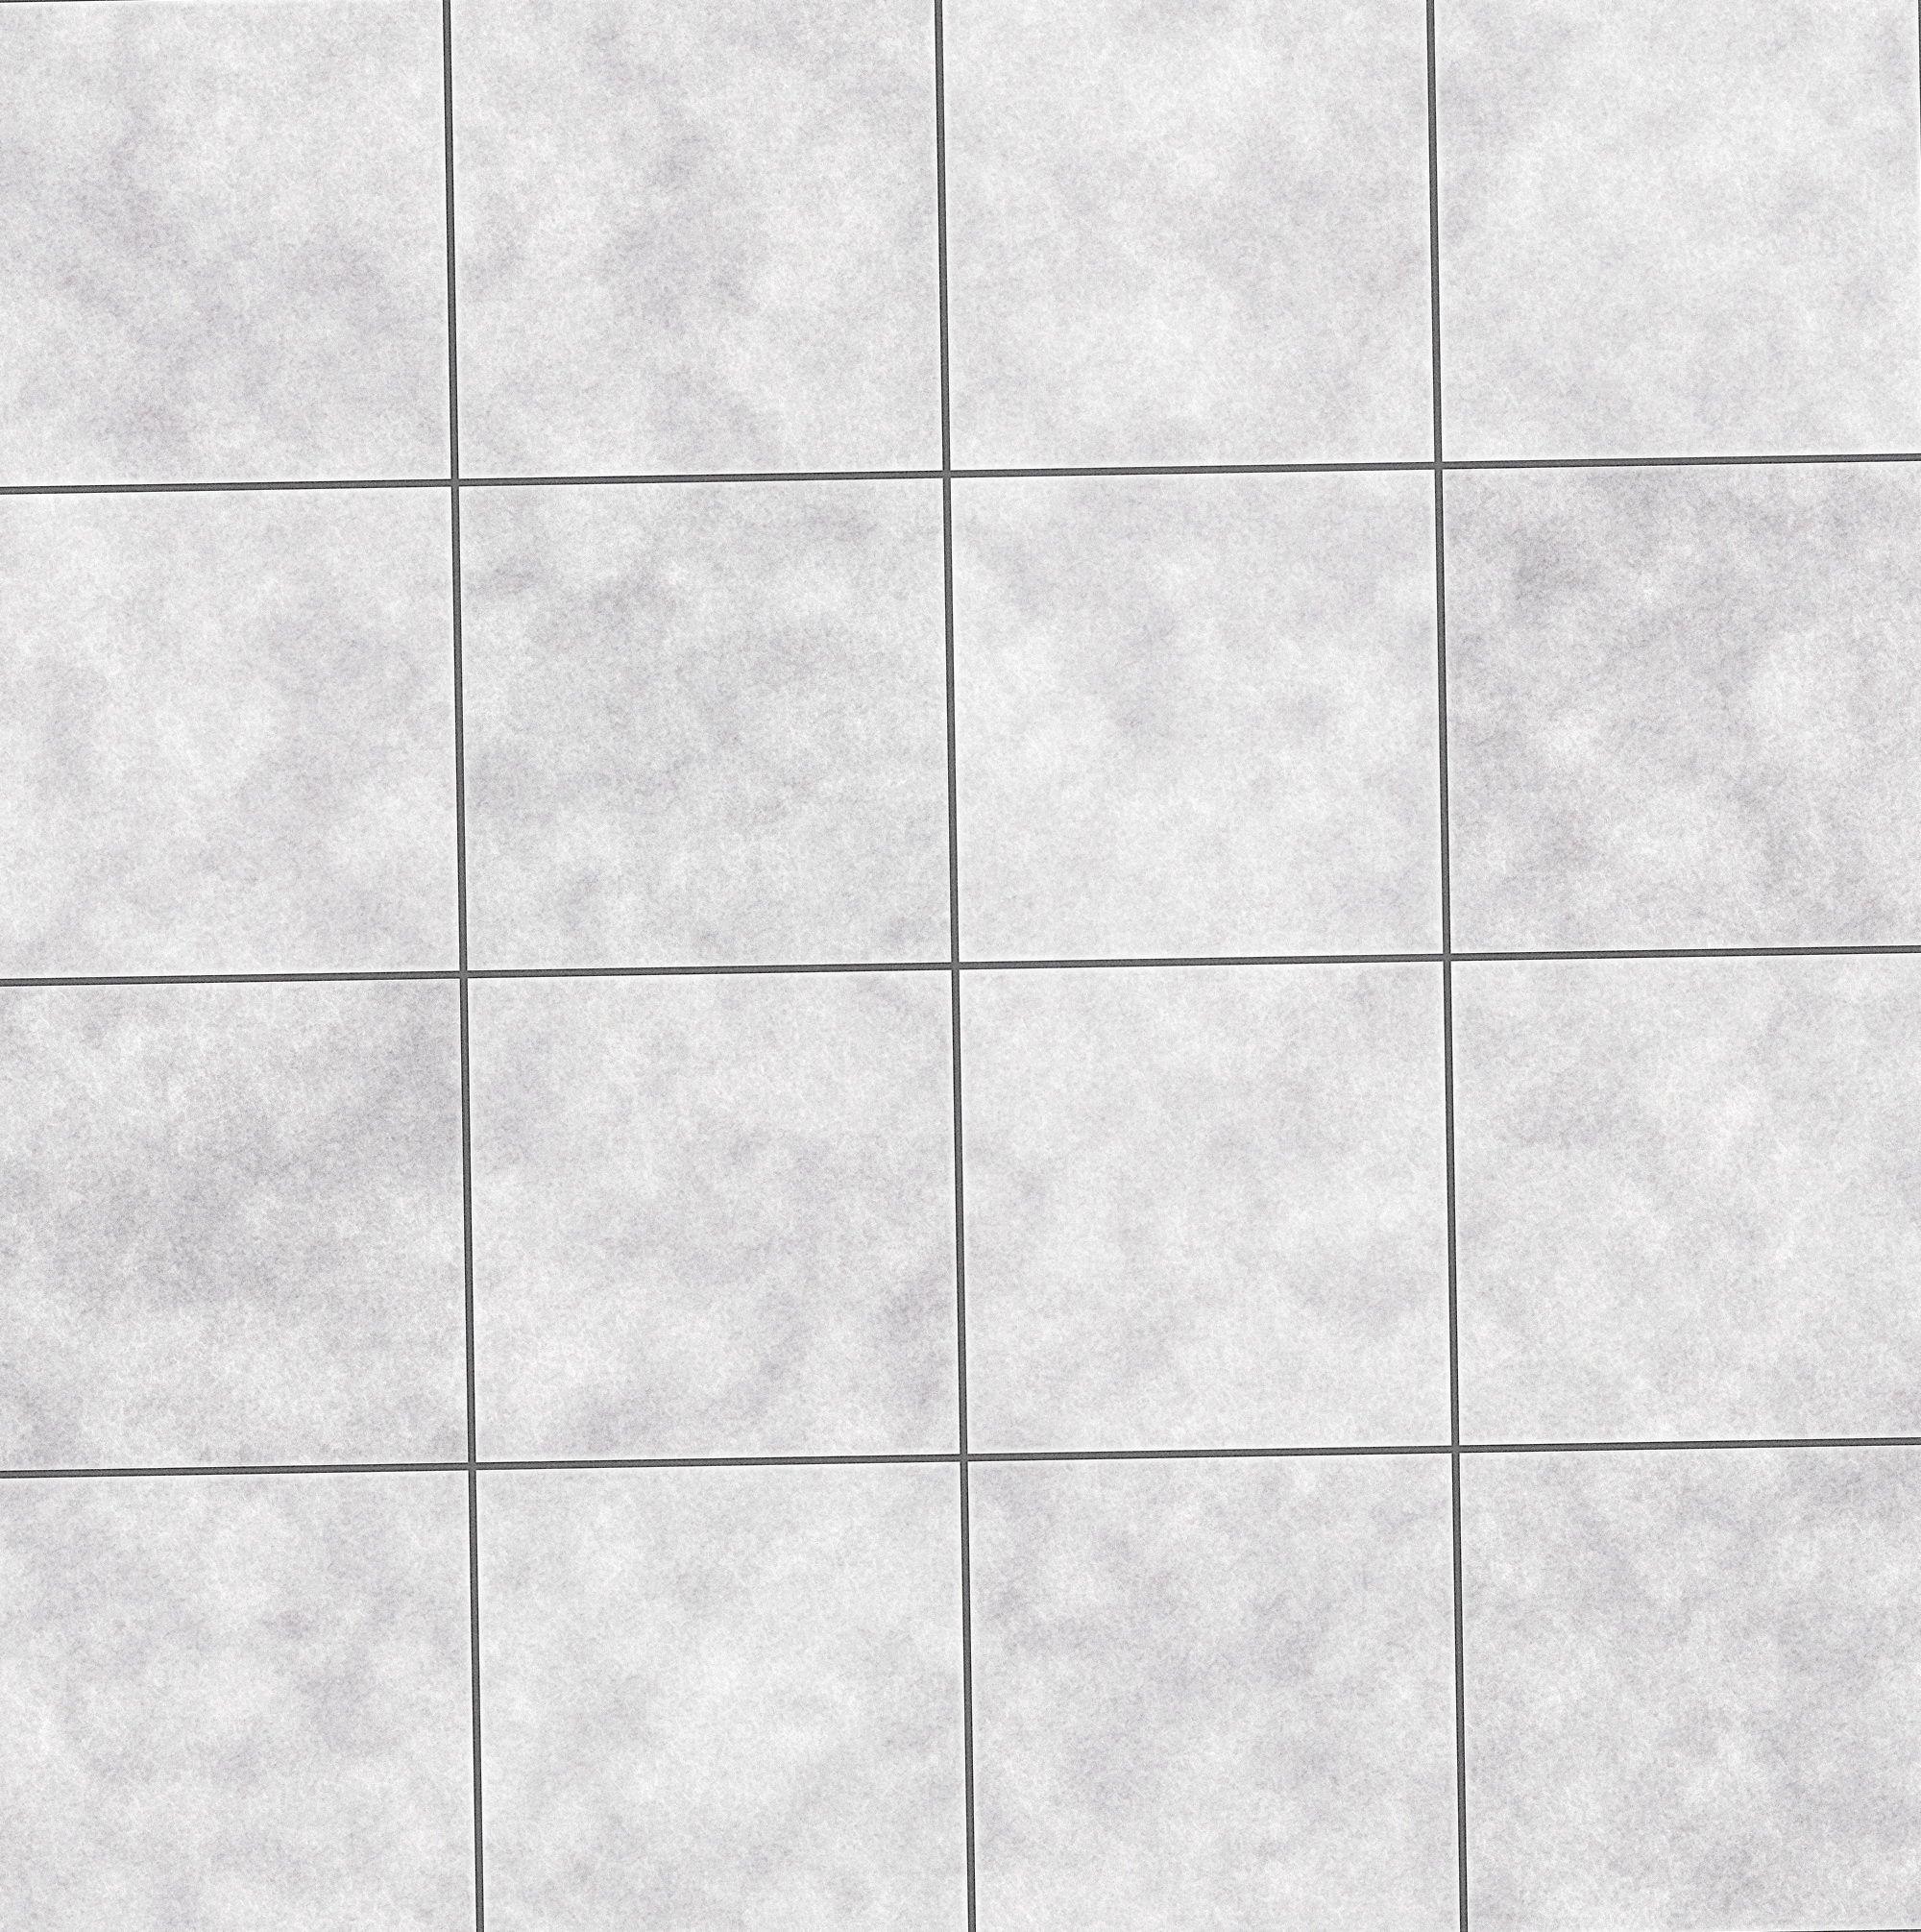 Bathroom Floor Tiles Texture White Home Design Ideas